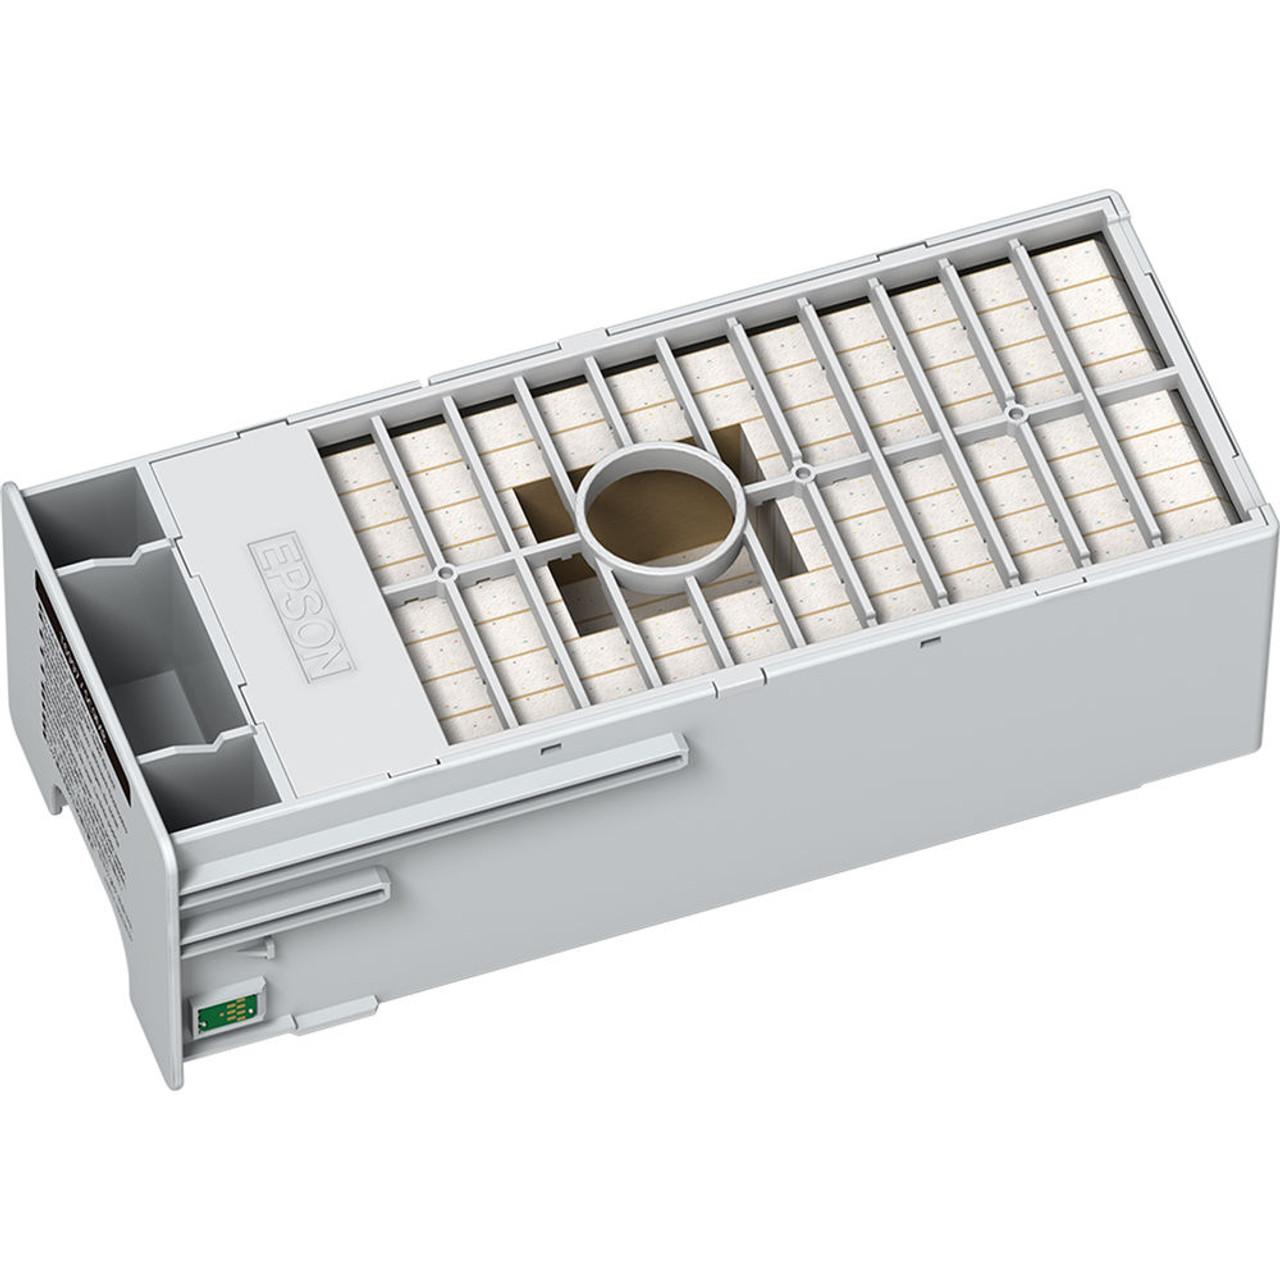 Epson T699700 Maintenance Tank for P-Series Printers